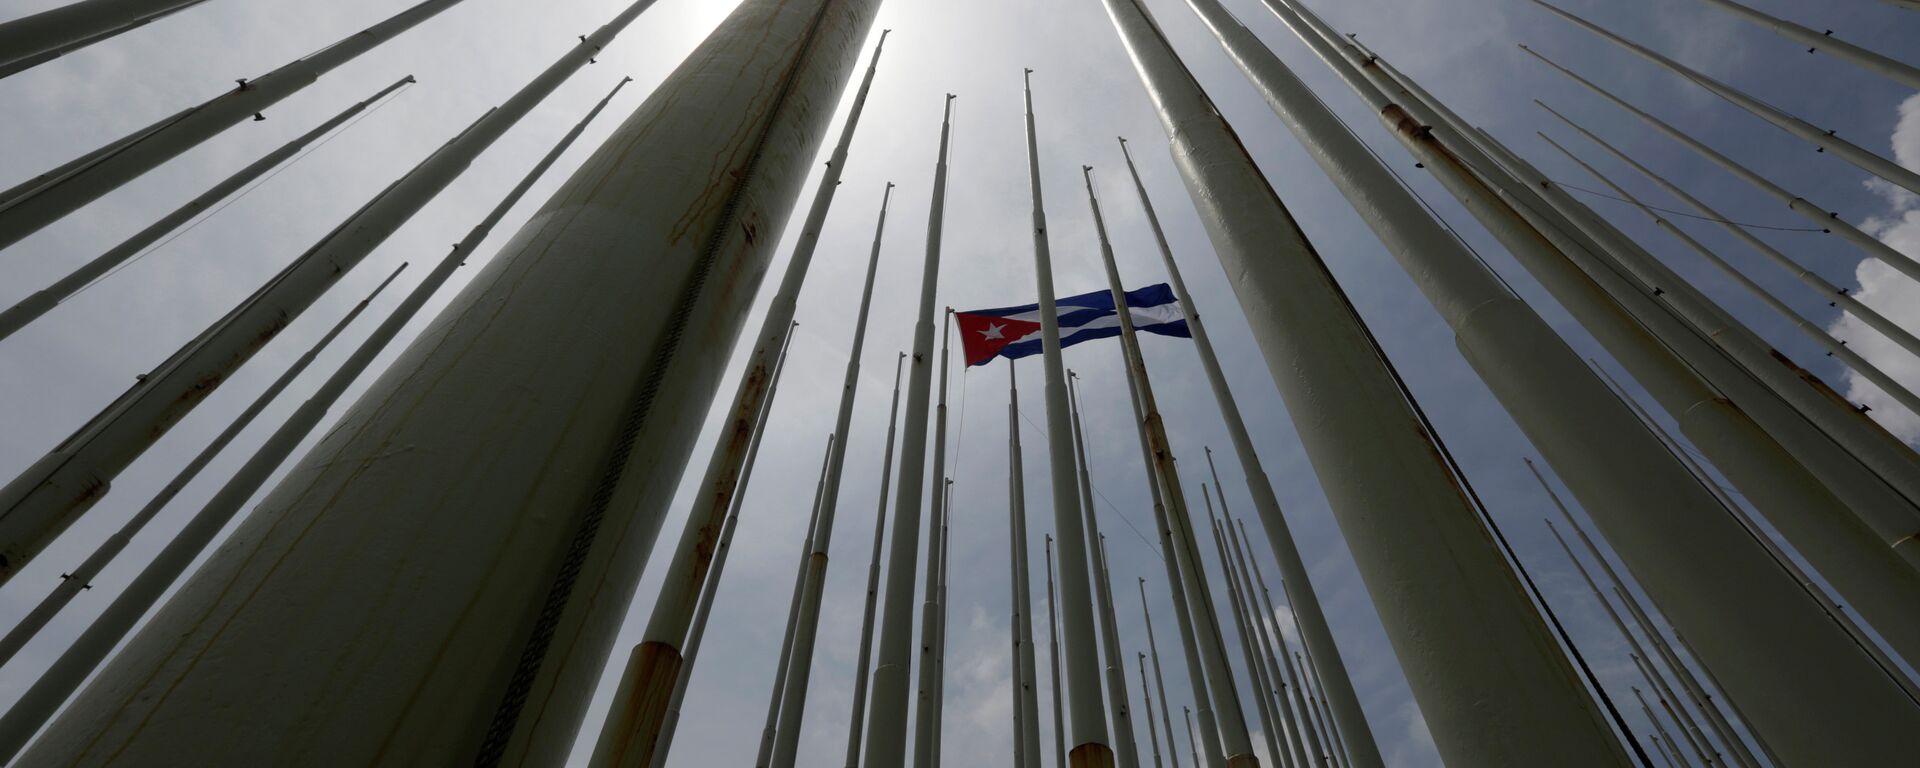 Bandera de Cuba frente de la embajada de EEUU en La Habana - Sputnik Mundo, 1920, 23.06.2021